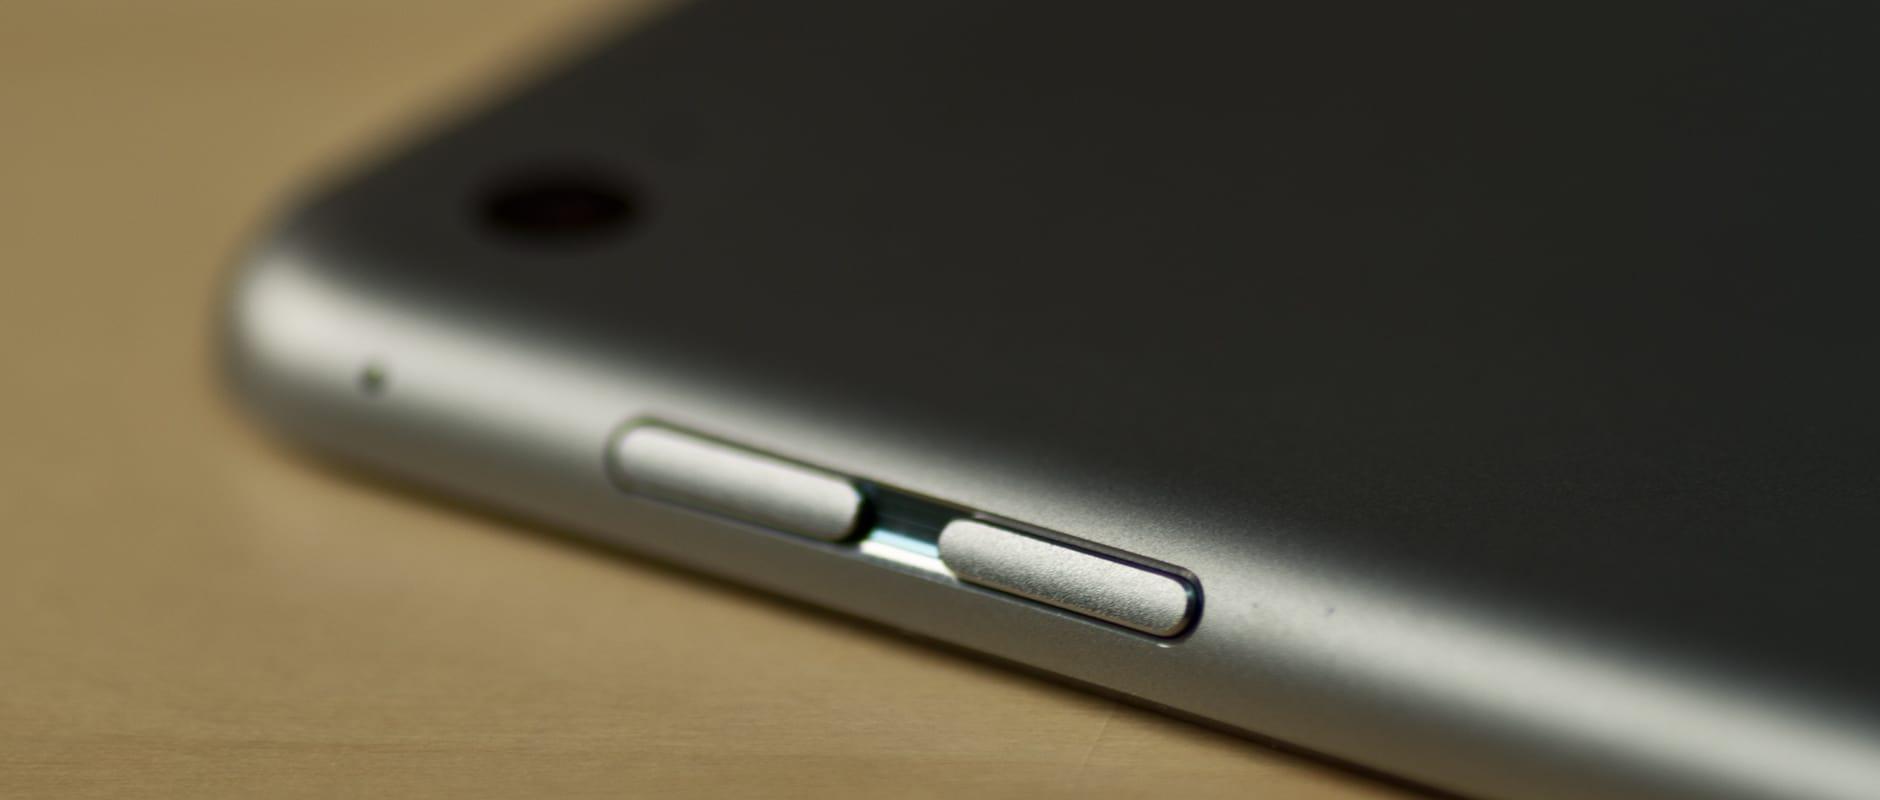 A photograph of the Apple iPad Air 2's volume rocker.